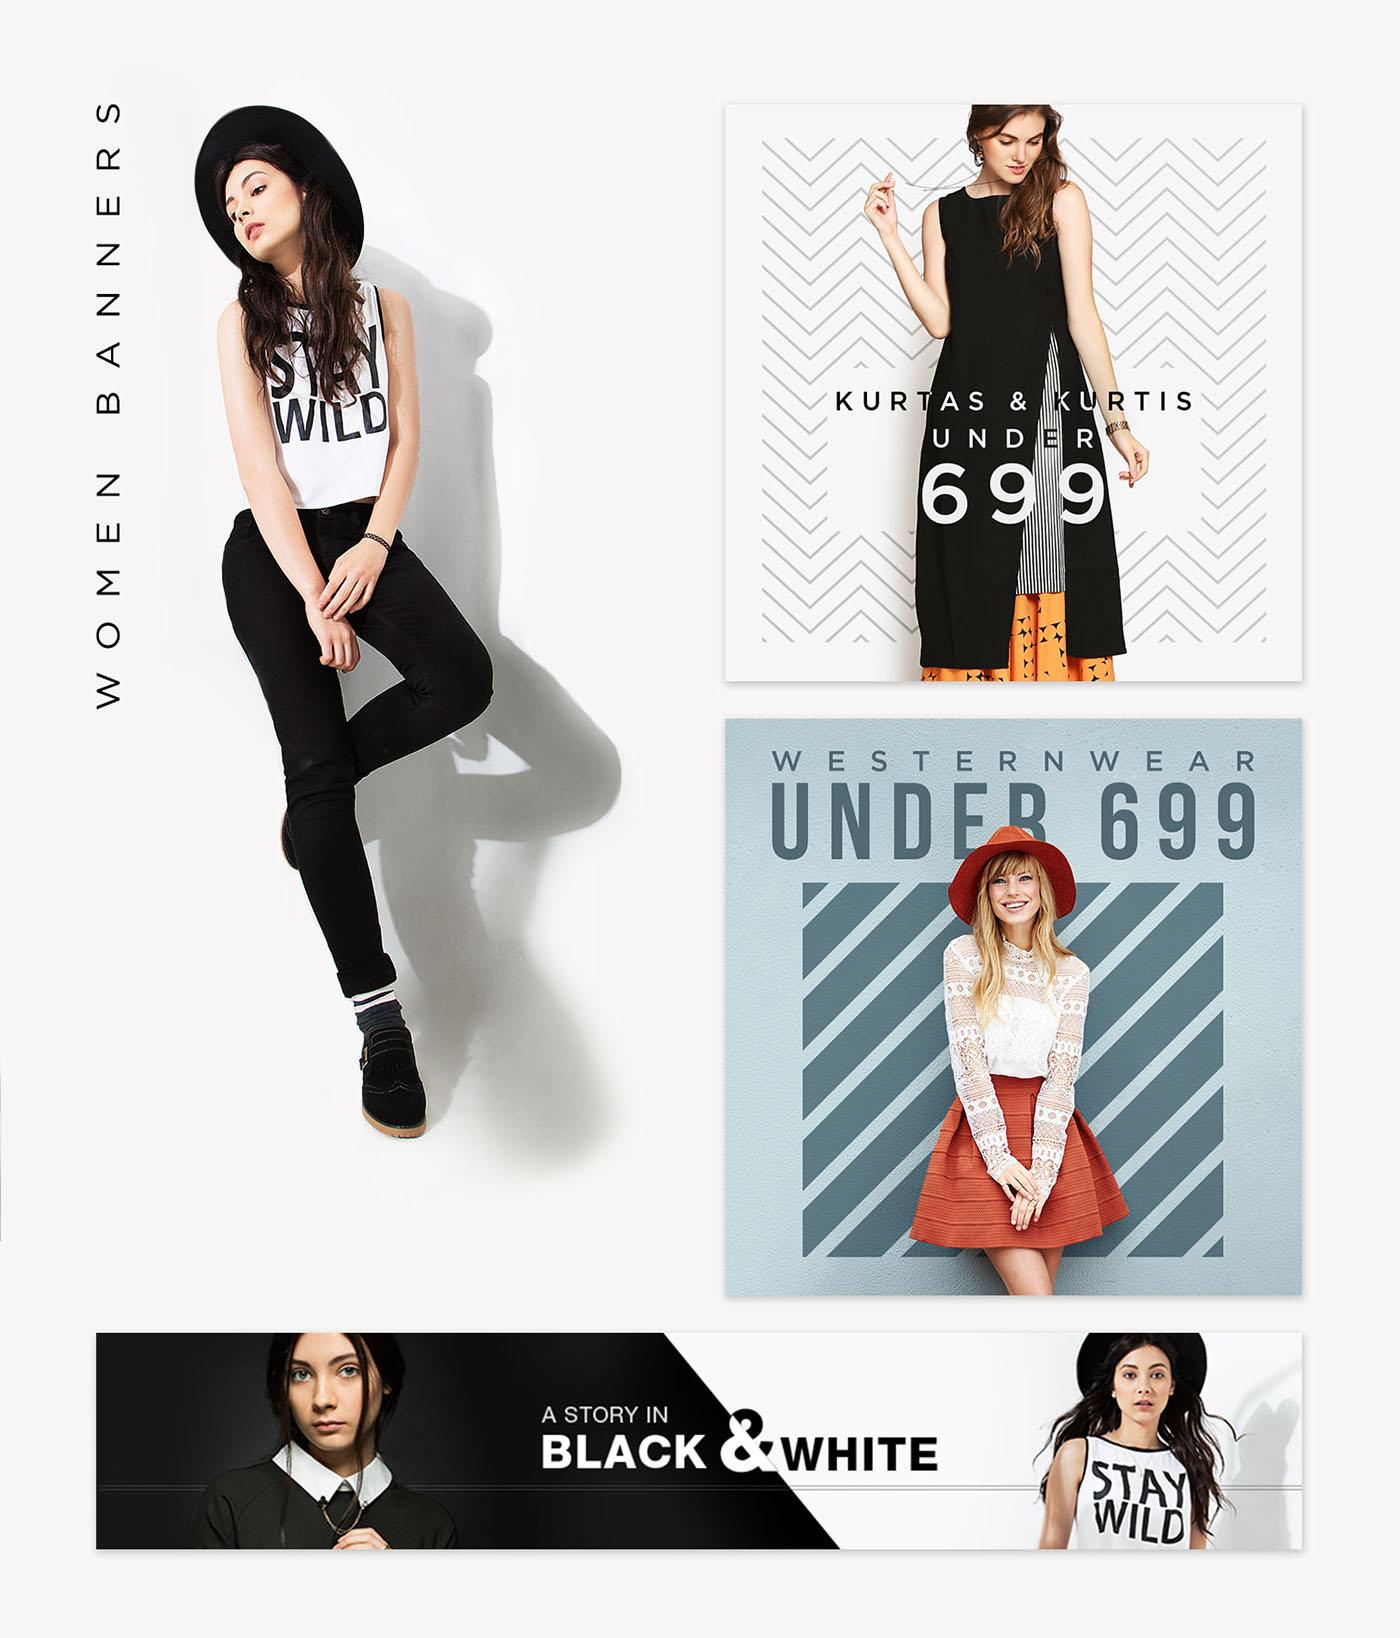 fashion web banners jensonart on behance